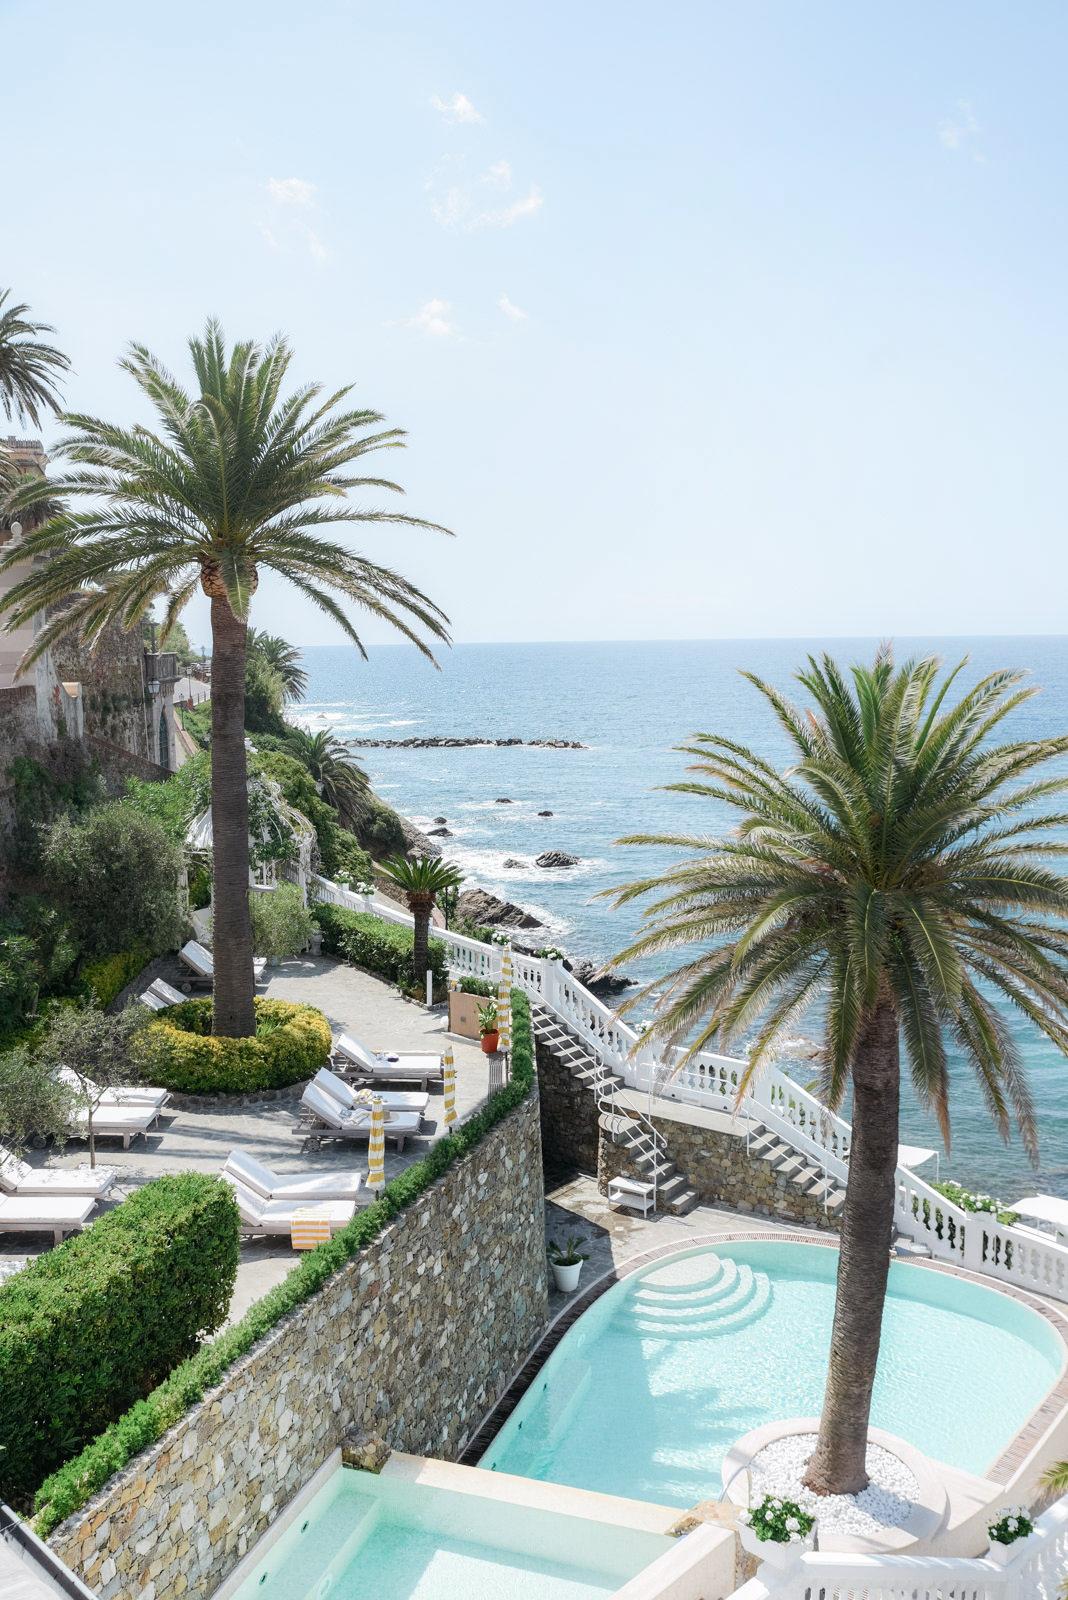 Blog-Mode-And-The-City-Lifestyle-Italie-Sestri-Levante-Cinque-Terre-12